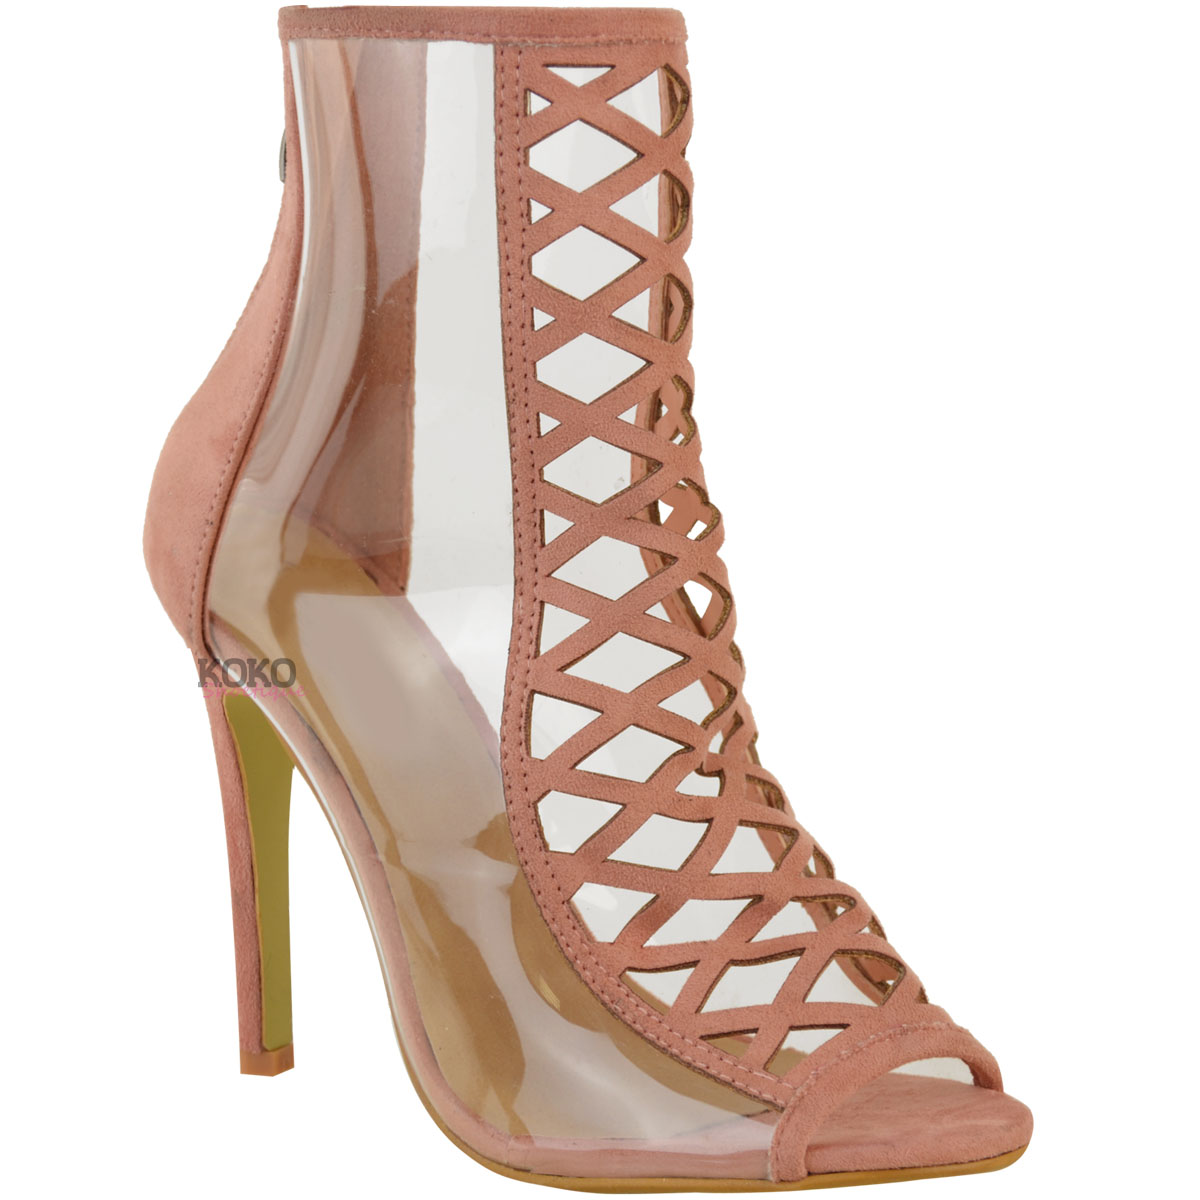 e766f9b2c41462 Womens Ladies High Heel Perspex Clear Sandals Celebrity Designer ...